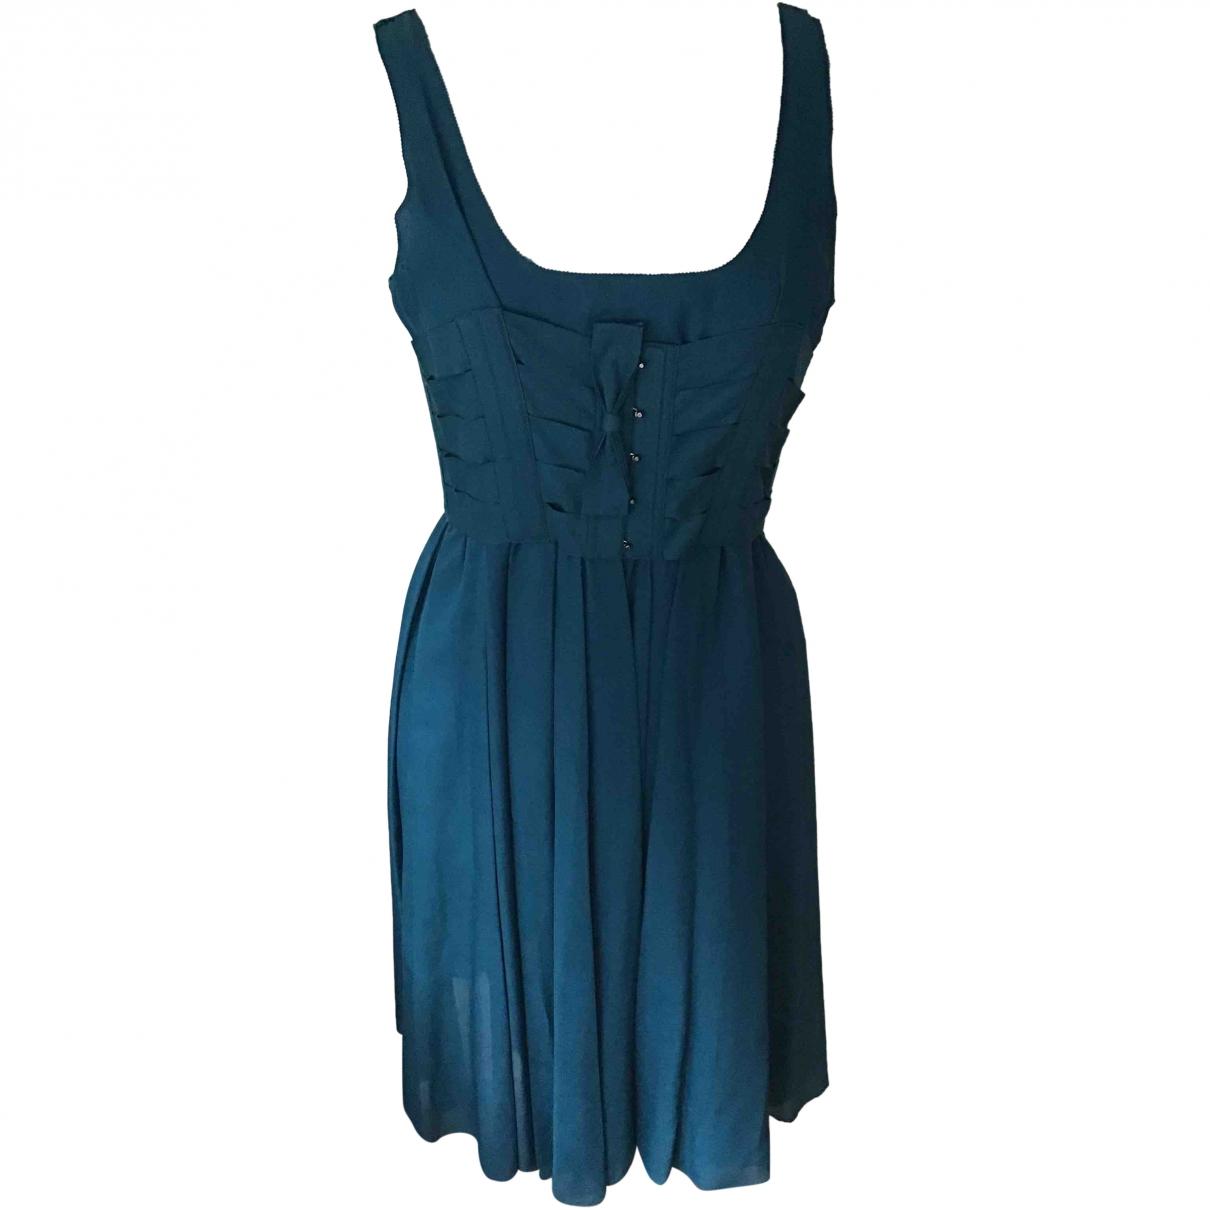 Twenty8twelve By S.miller - Robe   pour femme en soie - bleu